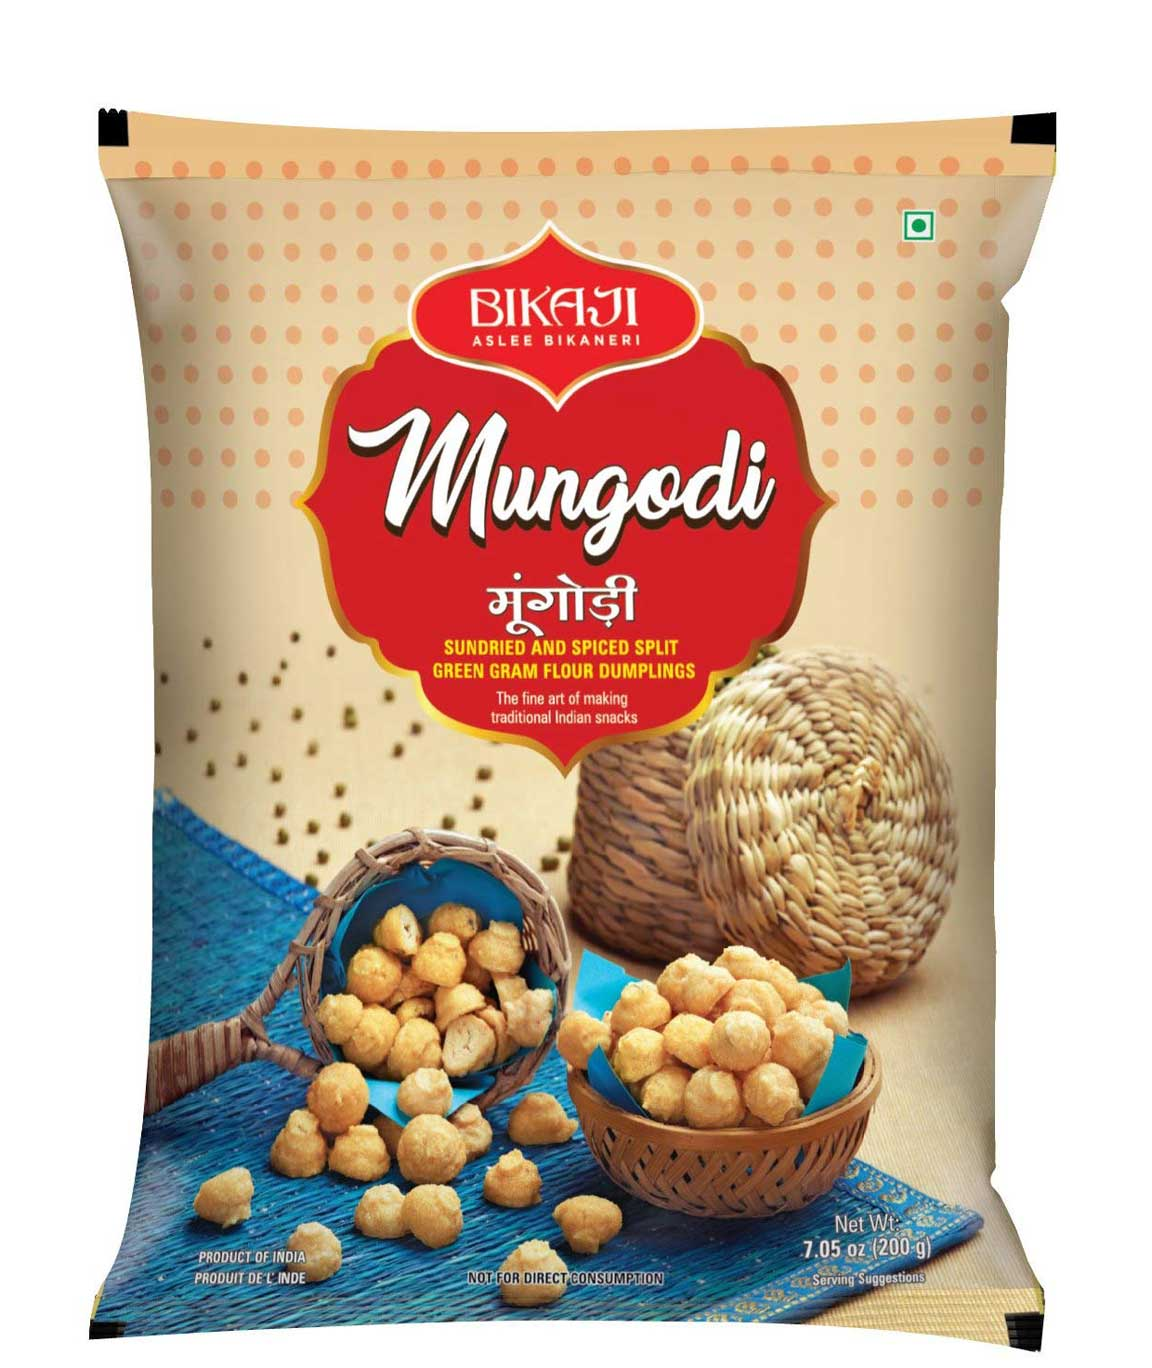 Bikaji Mungoli Badi - Traditional Rajasthani Moong Dal Mangodi - Sundried and Spiced Dumplings -100% Vegetarian Indian Snack - 200gm - (Pack of 4)